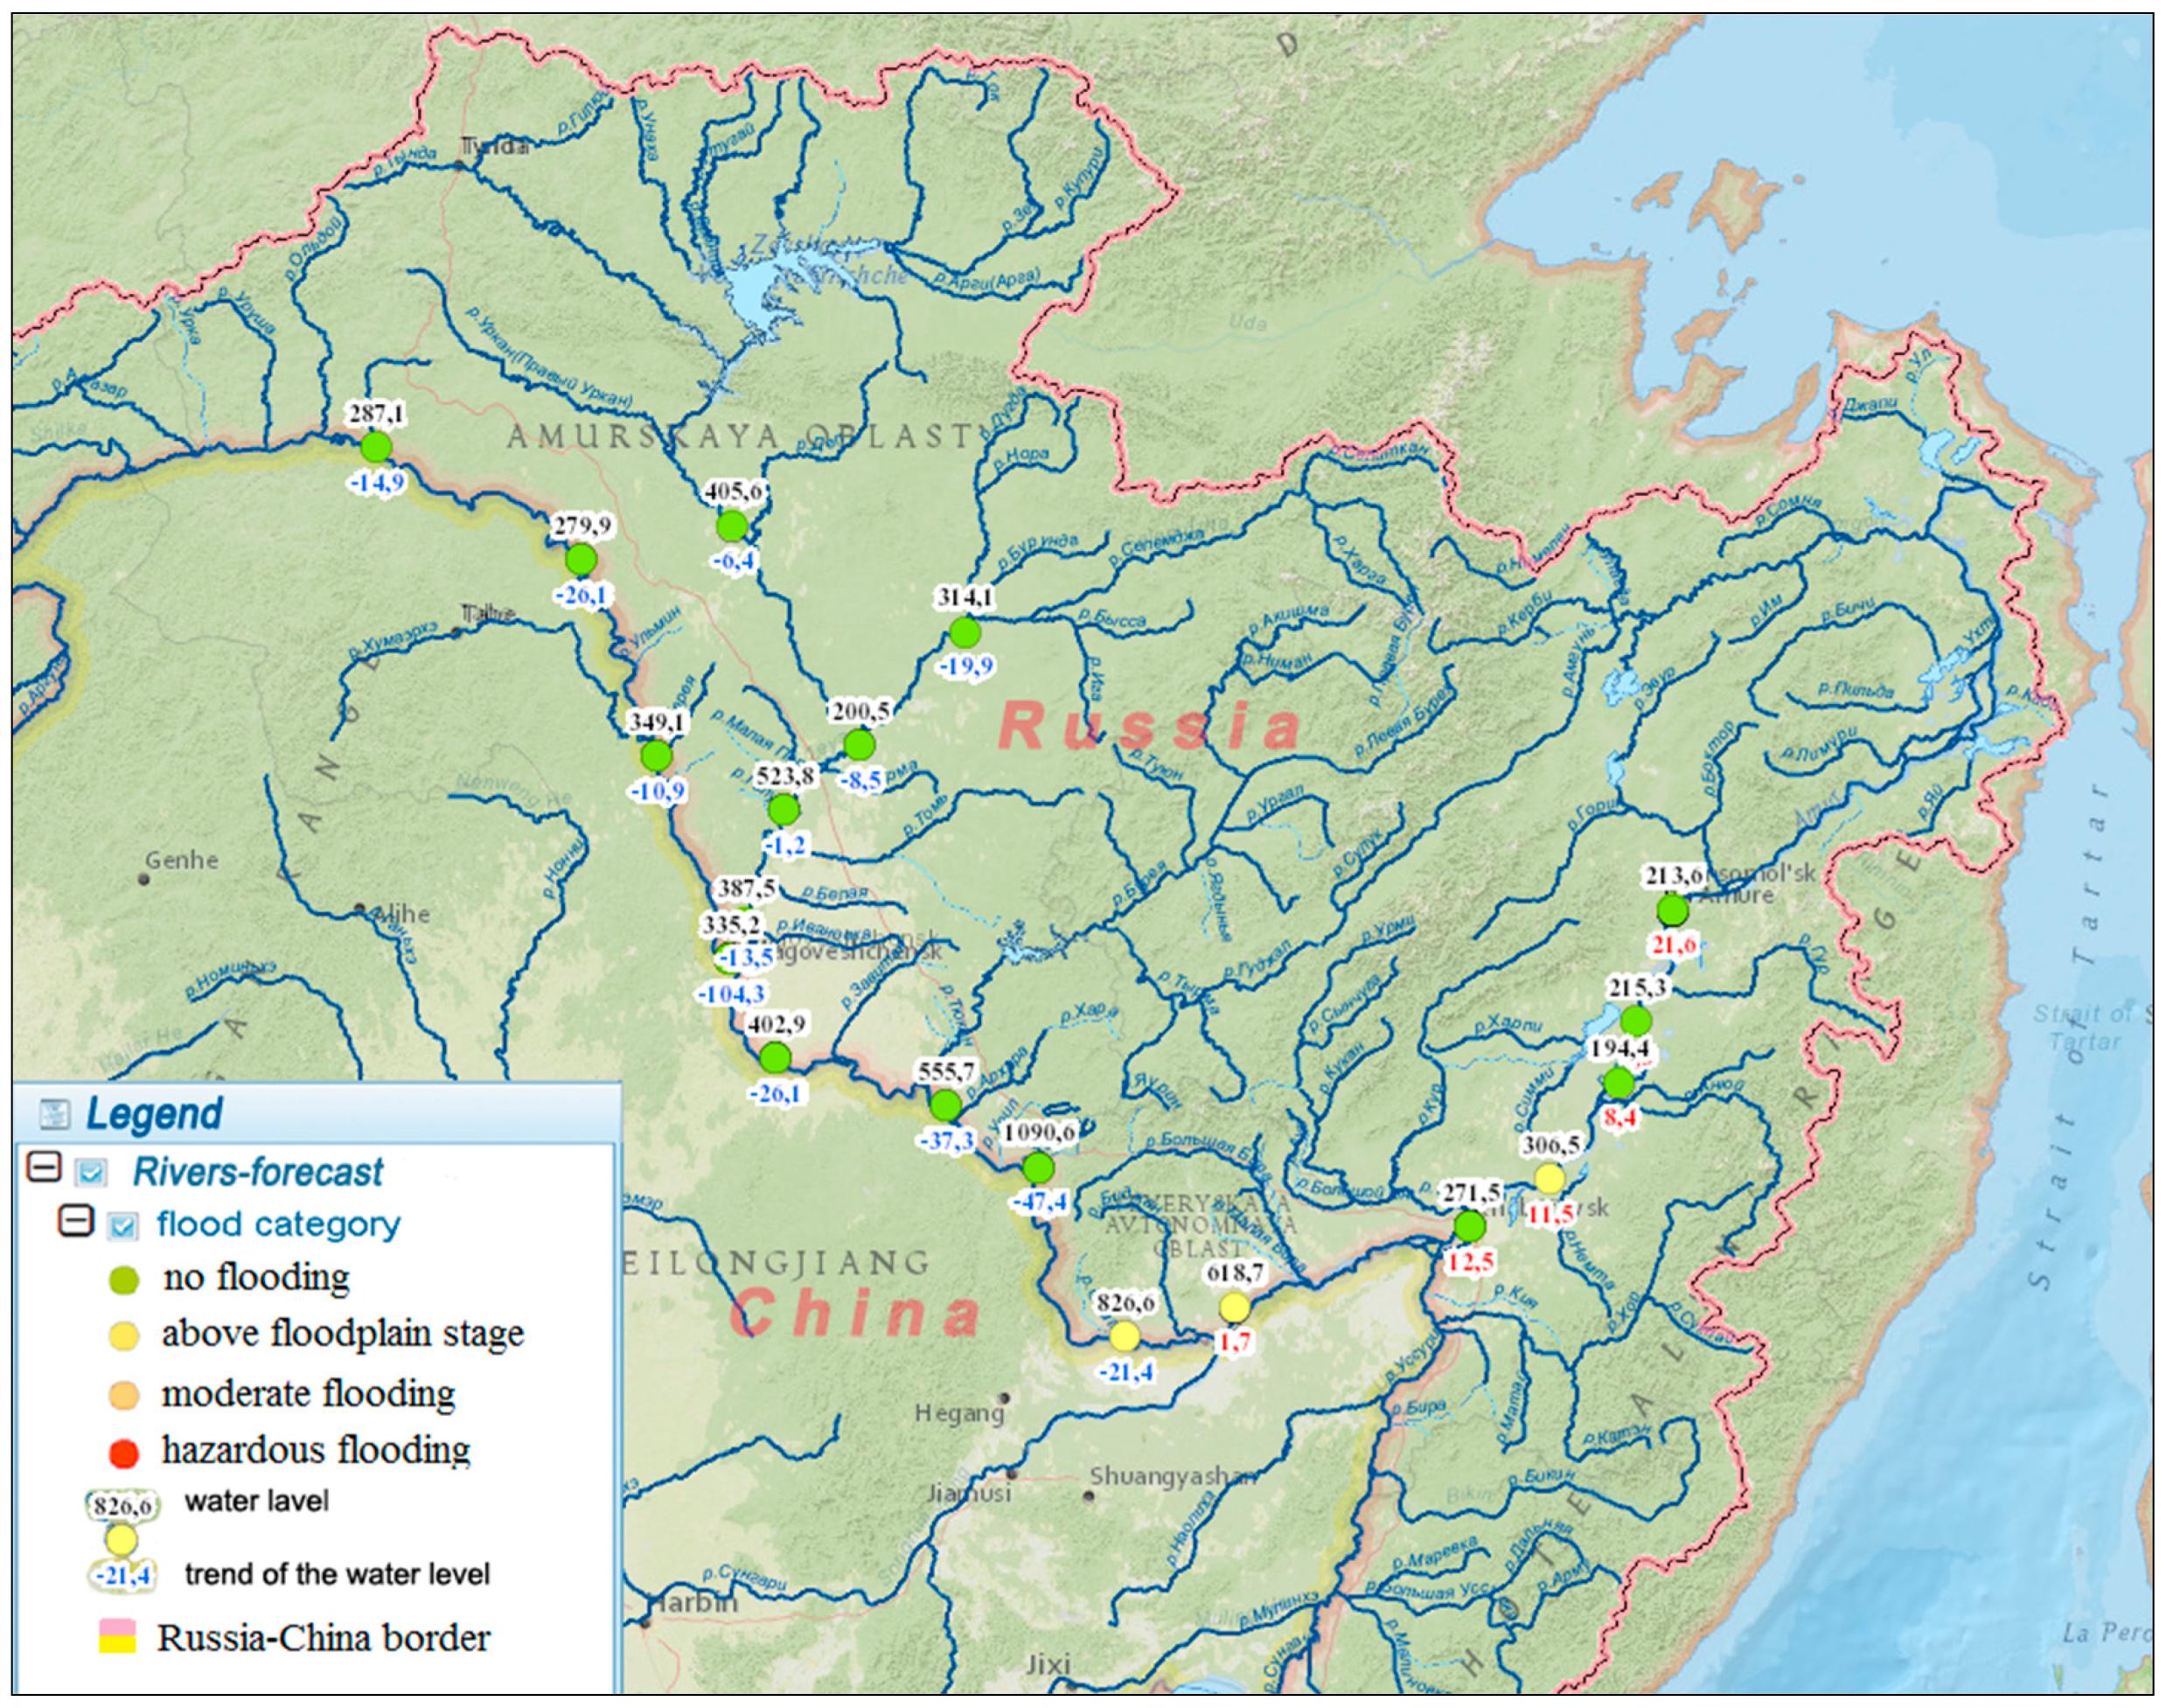 Amur River Map on yangtze river map, ganges river, gobi desert map, amu darya river map, xi jiang river map, ob river, aral sea map, chang jiang river map, moscow map, ural river, mekong map, yalu river, mackenzie river, brahmaputra river, lake baikal, brahmaputra river map, danube map, euphrates river map, irrawaddy river map, don river map, ganges river map, amu darya, yangtze river, kamchatka peninsula, yenisei river map, kamchatka peninsula map, russia map, caspian sea map, himalayas map, lena river, yellow river, yenisei river, kuril islands, bering sea map, indus river,